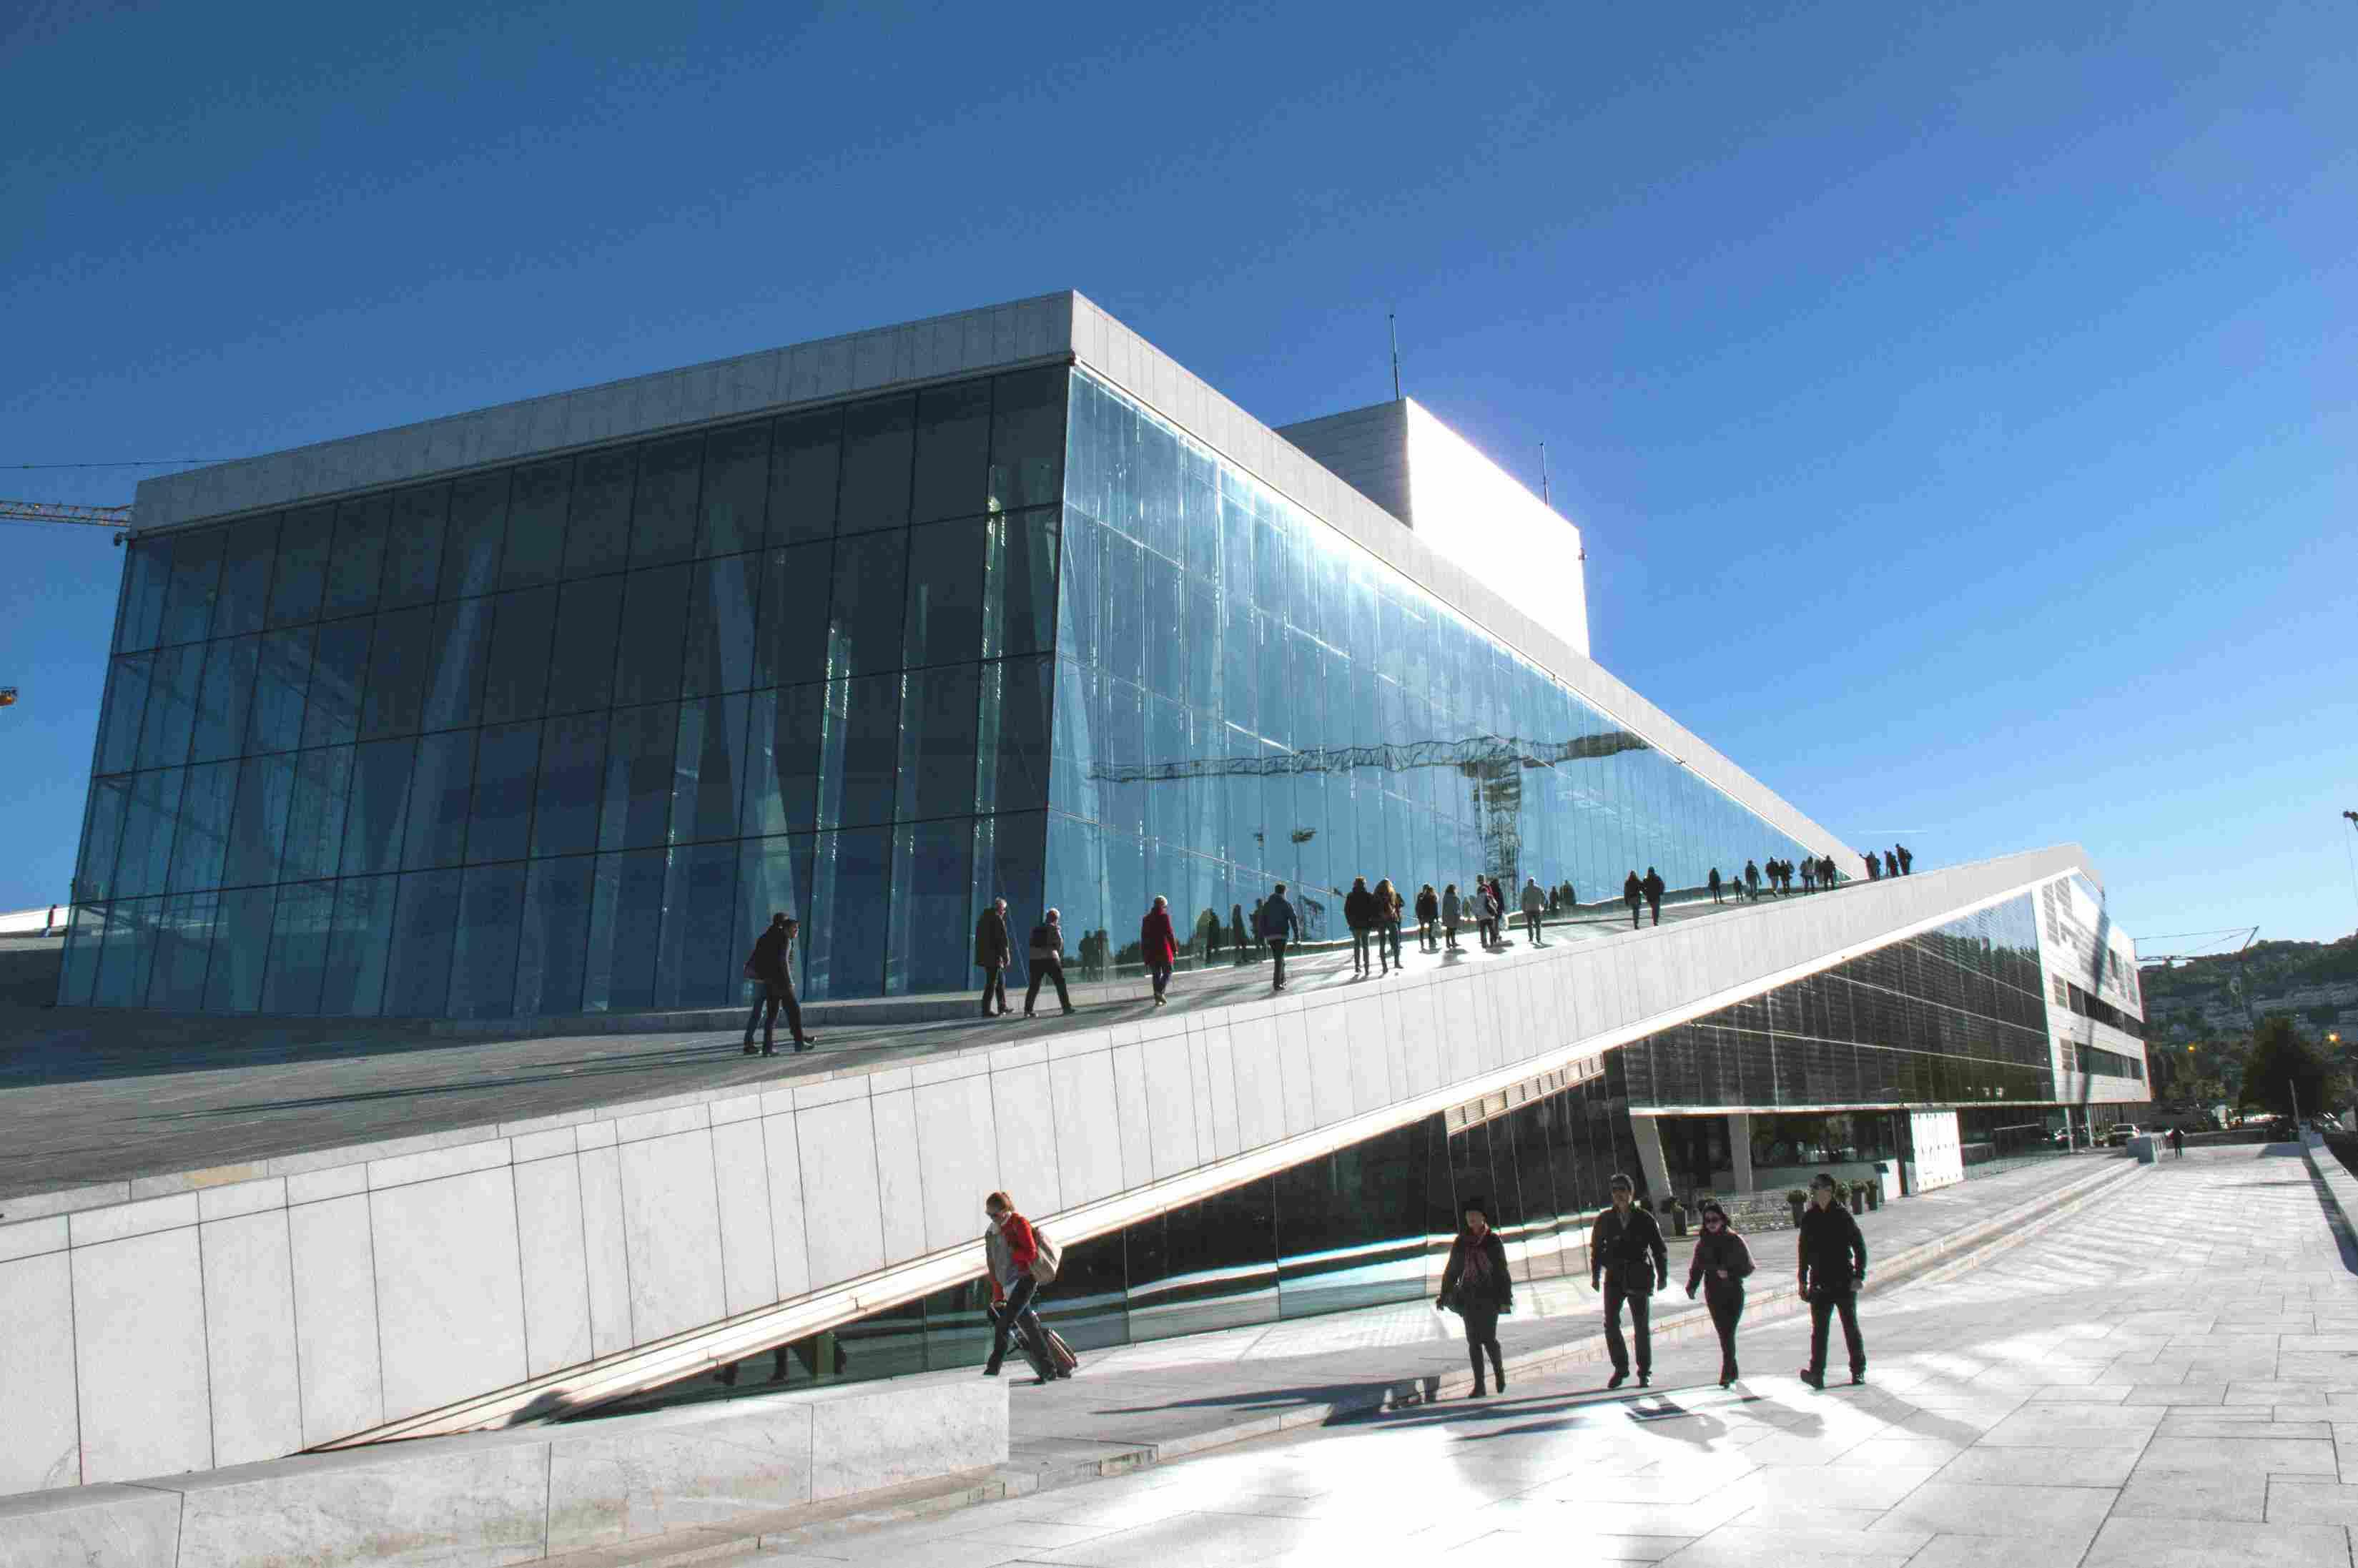 Walking the Oslo Opera House